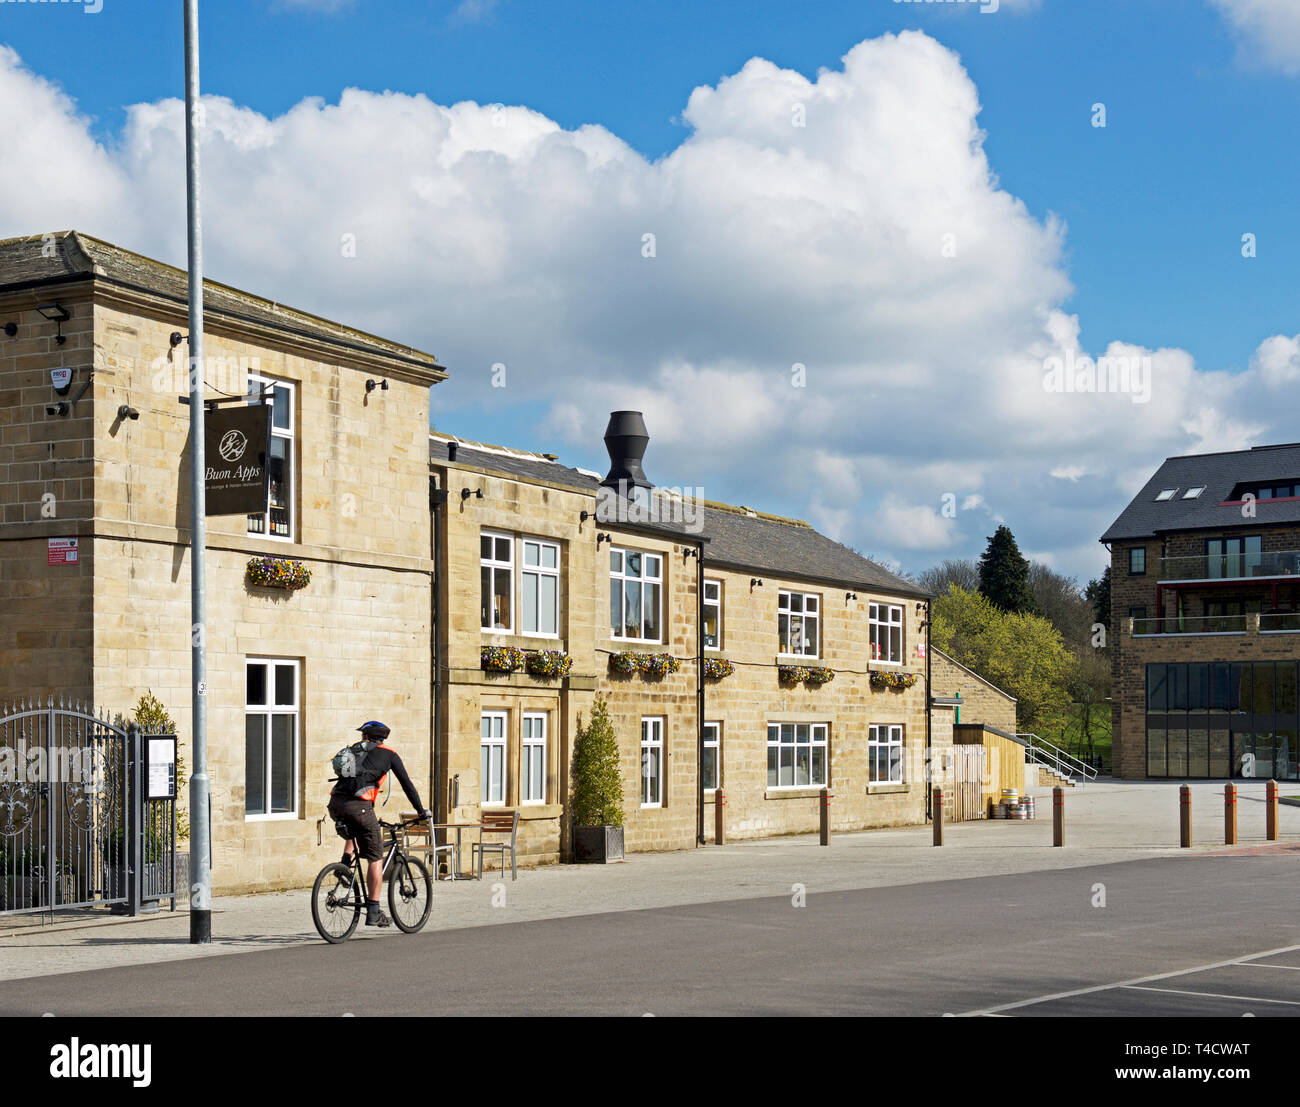 Buon Apps Restaurante Italiano, Mill Lane, Otley, West Yorkshire, Inglaterra Imagen De Stock